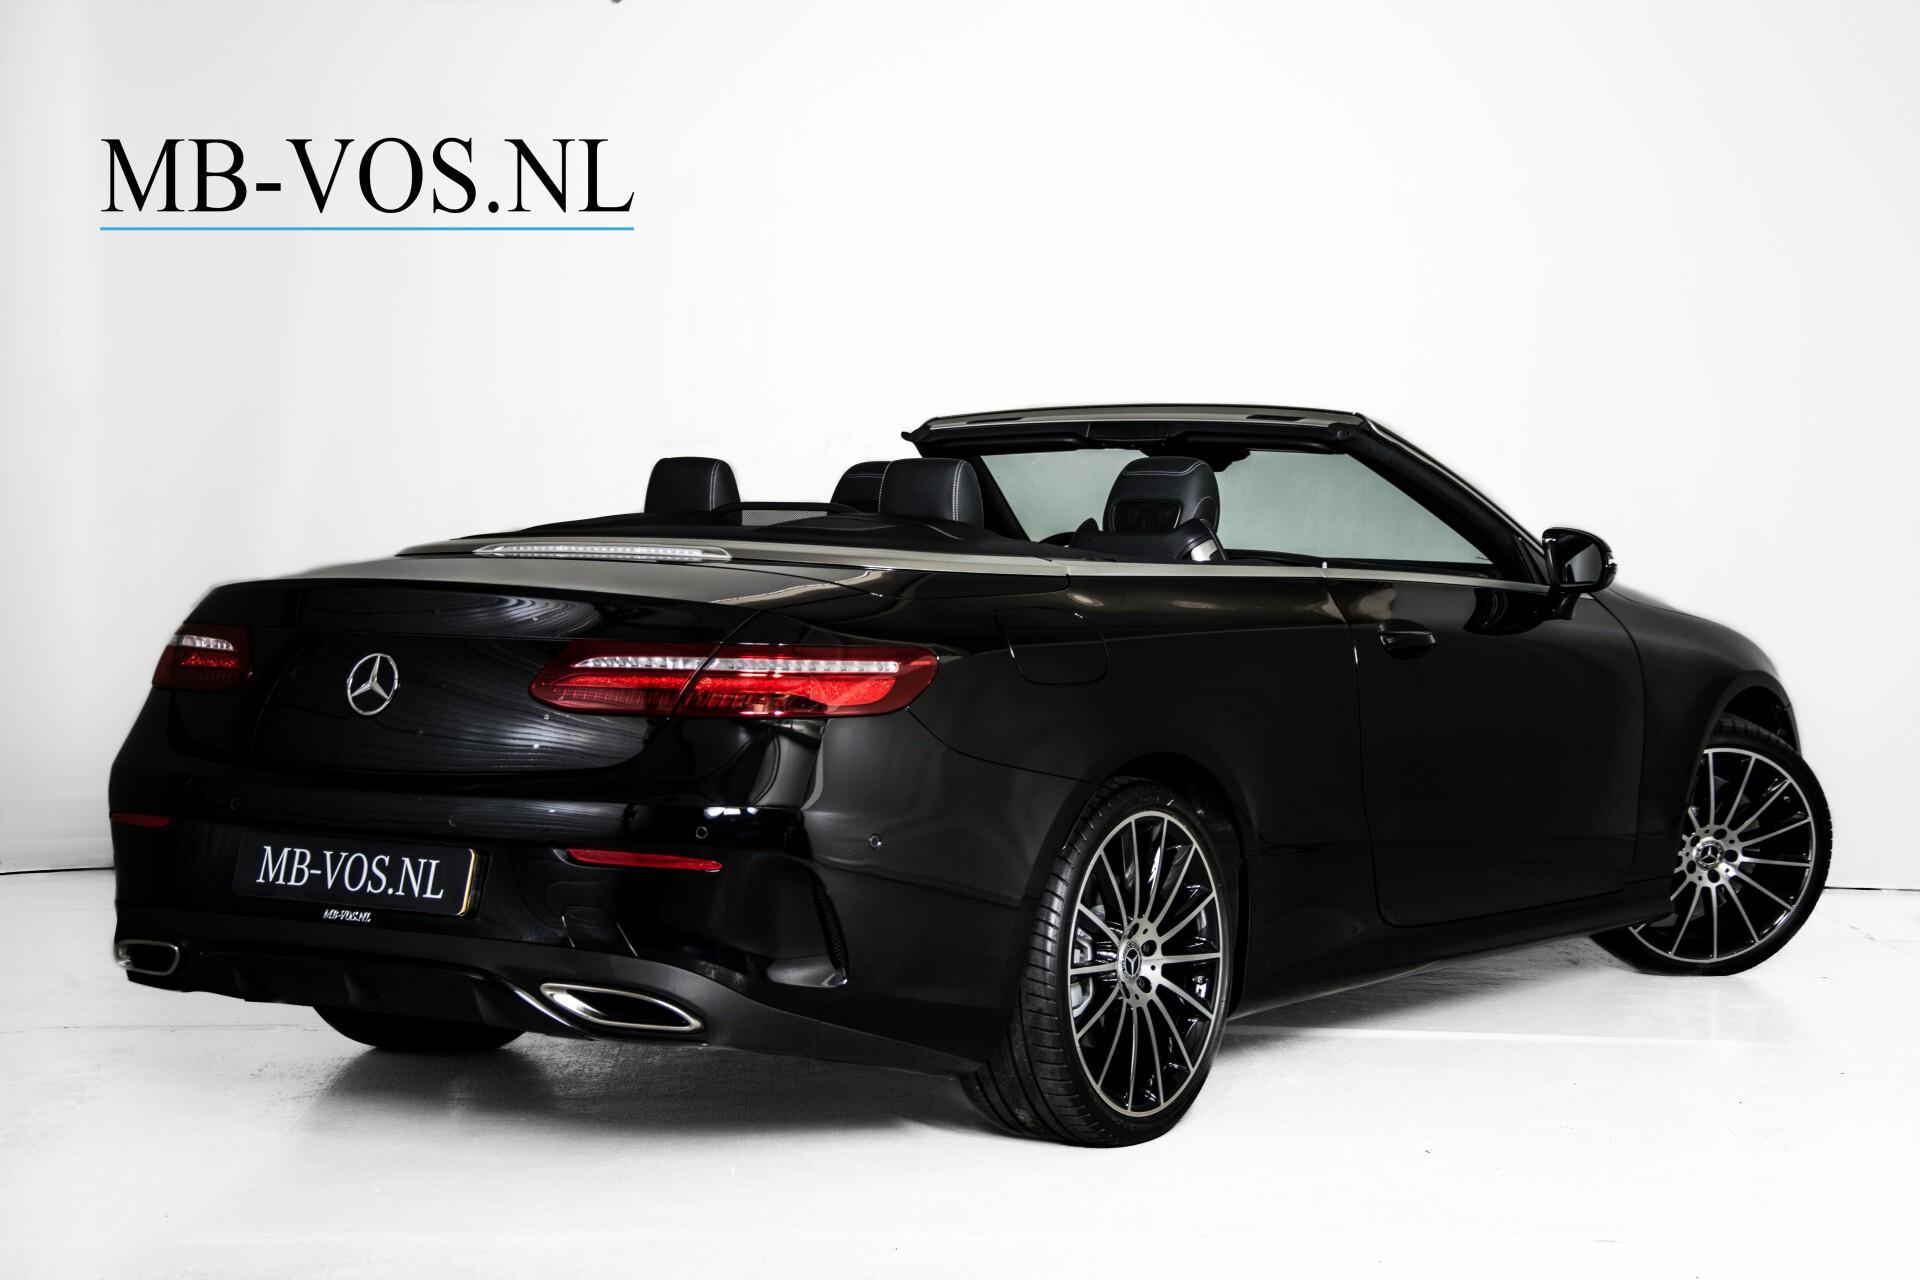 Mercedes-Benz E-Klasse Cabrio 350 AMG Night Distronic Pro/Burmester/Widescreen/Mem/Camera/Dynamic Body Aut9 Foto 3